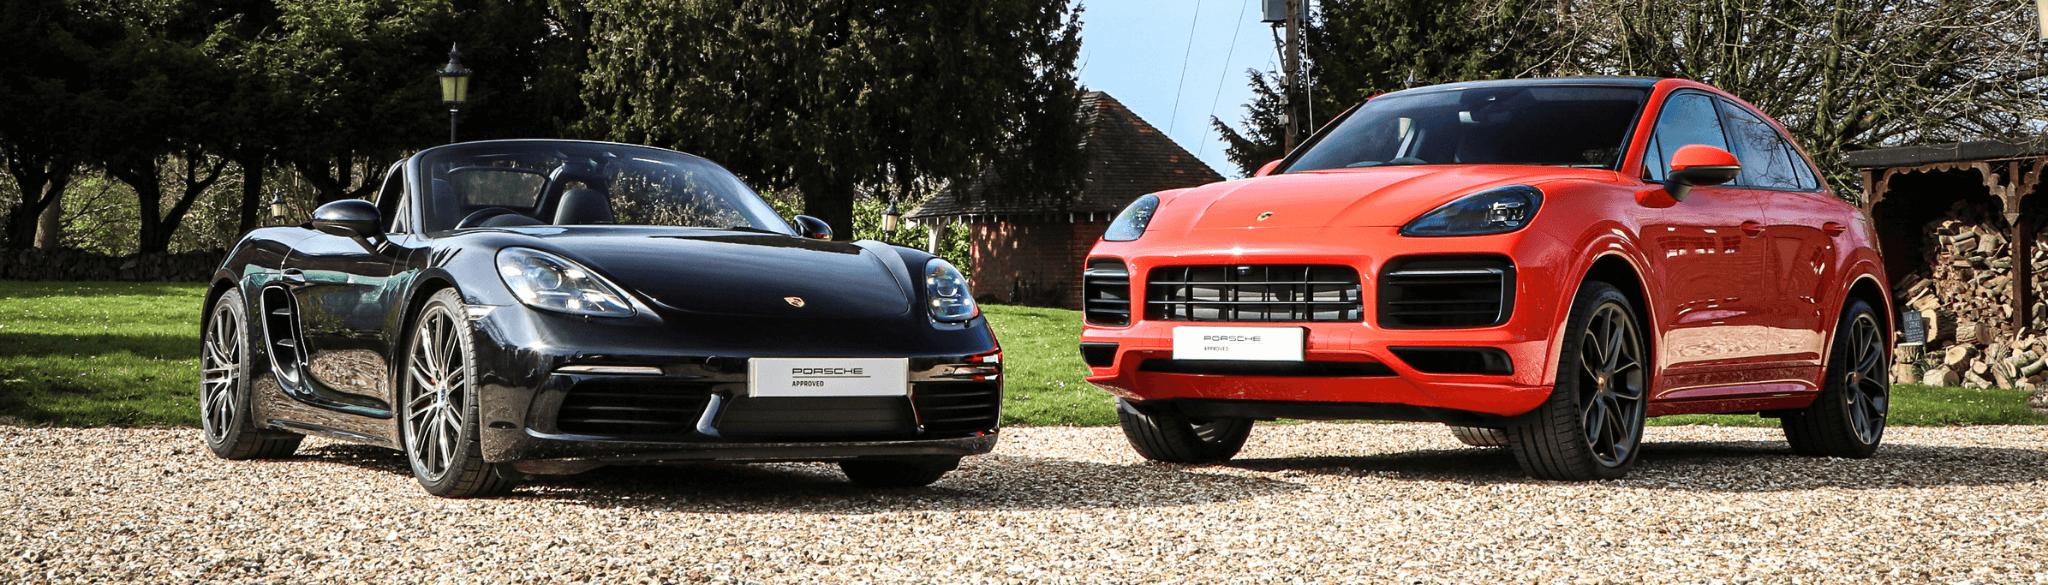 Porsche Cayanne and Porsche 718 Boxster (1)